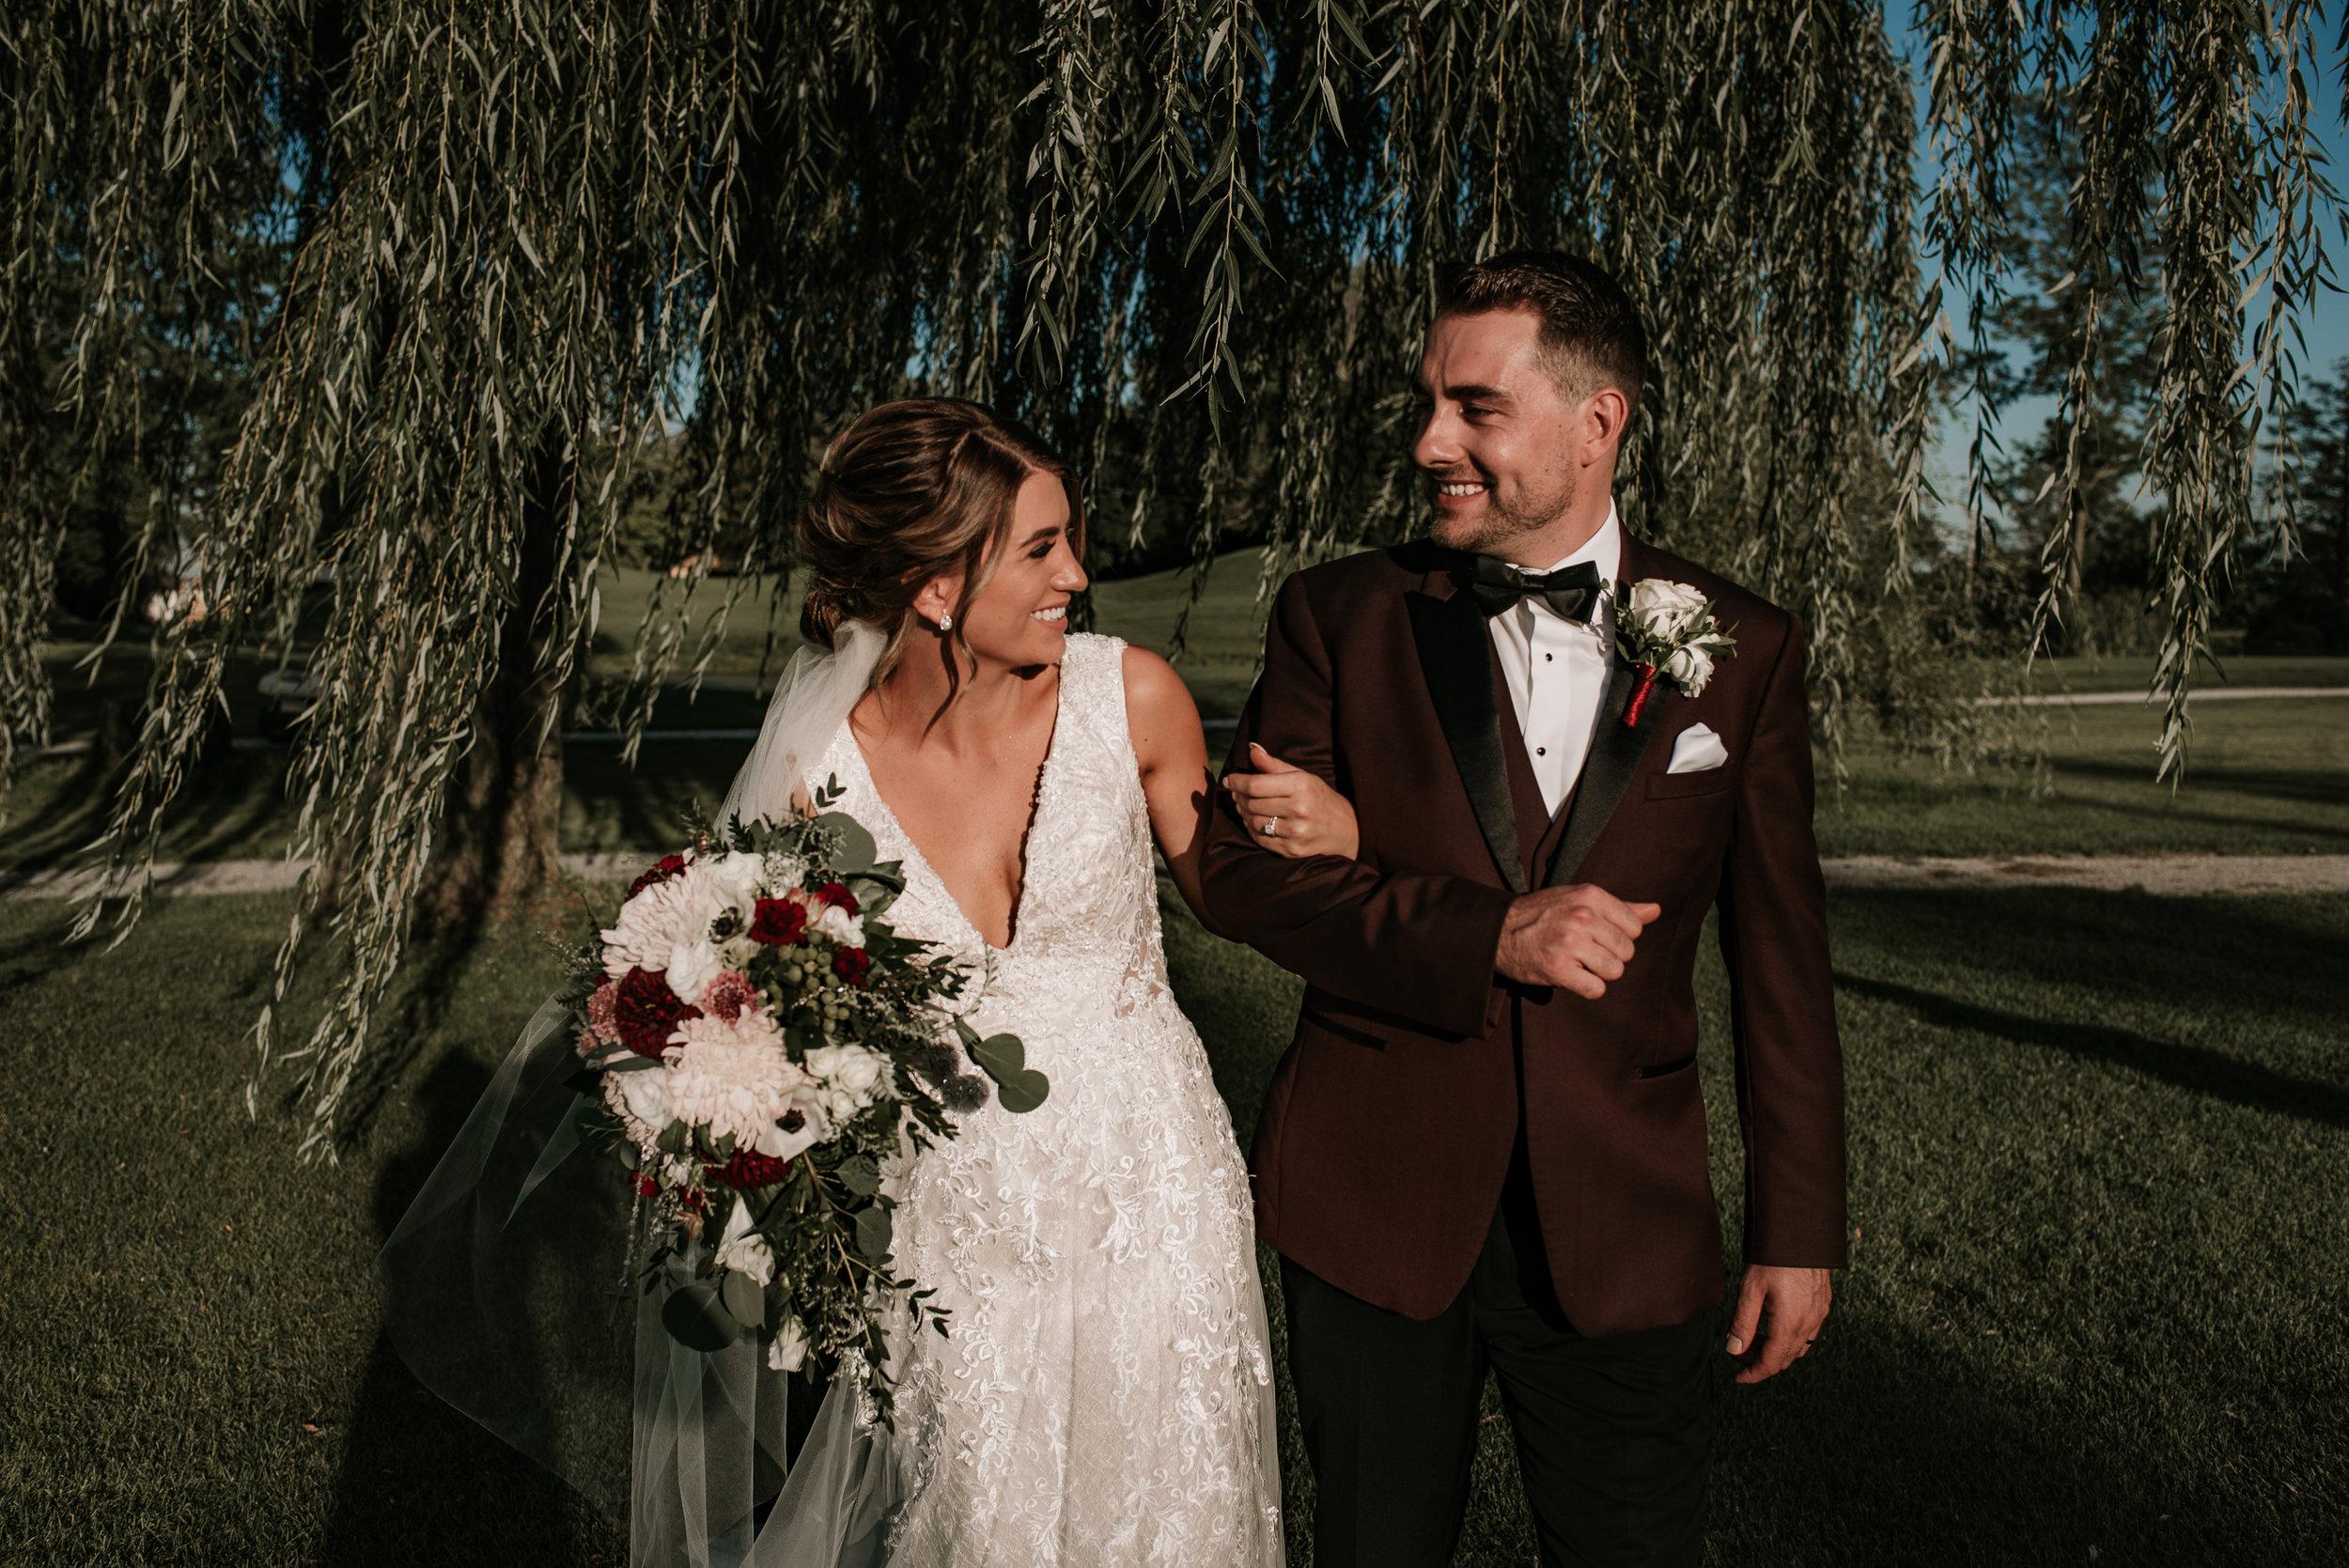 Claremont_fourseasons_Wedding-306.jpg